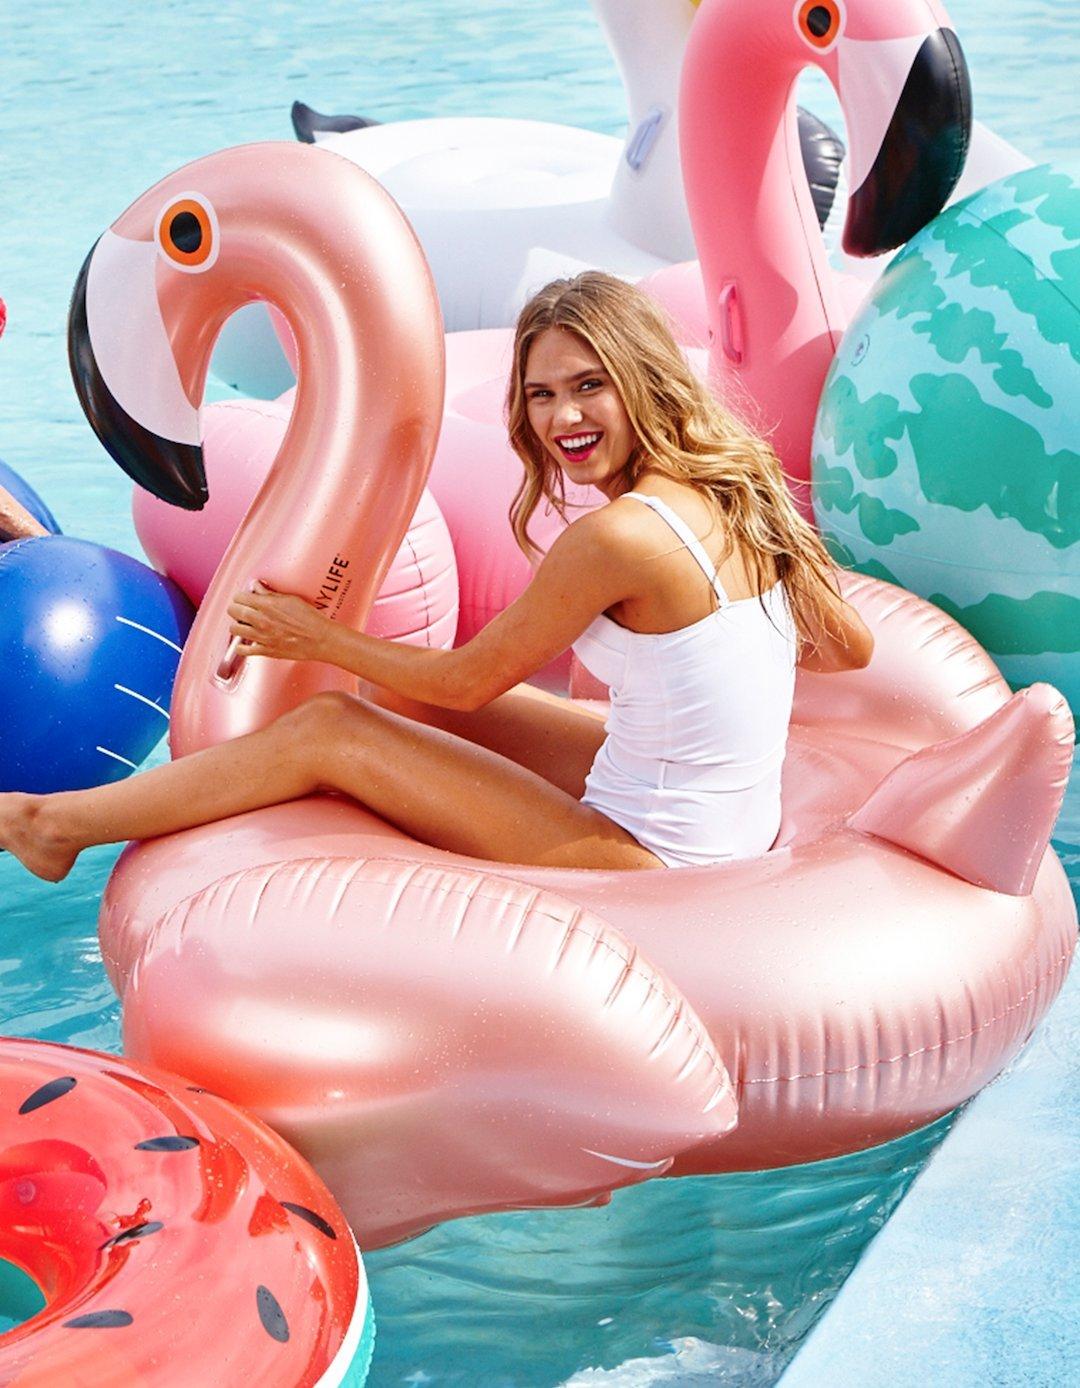 Amazon.com: Sunnylife Luxury Adult Inflatable Pool Float Ride On Beach Toy    Rose Gold Flamingo: Toys U0026 Games